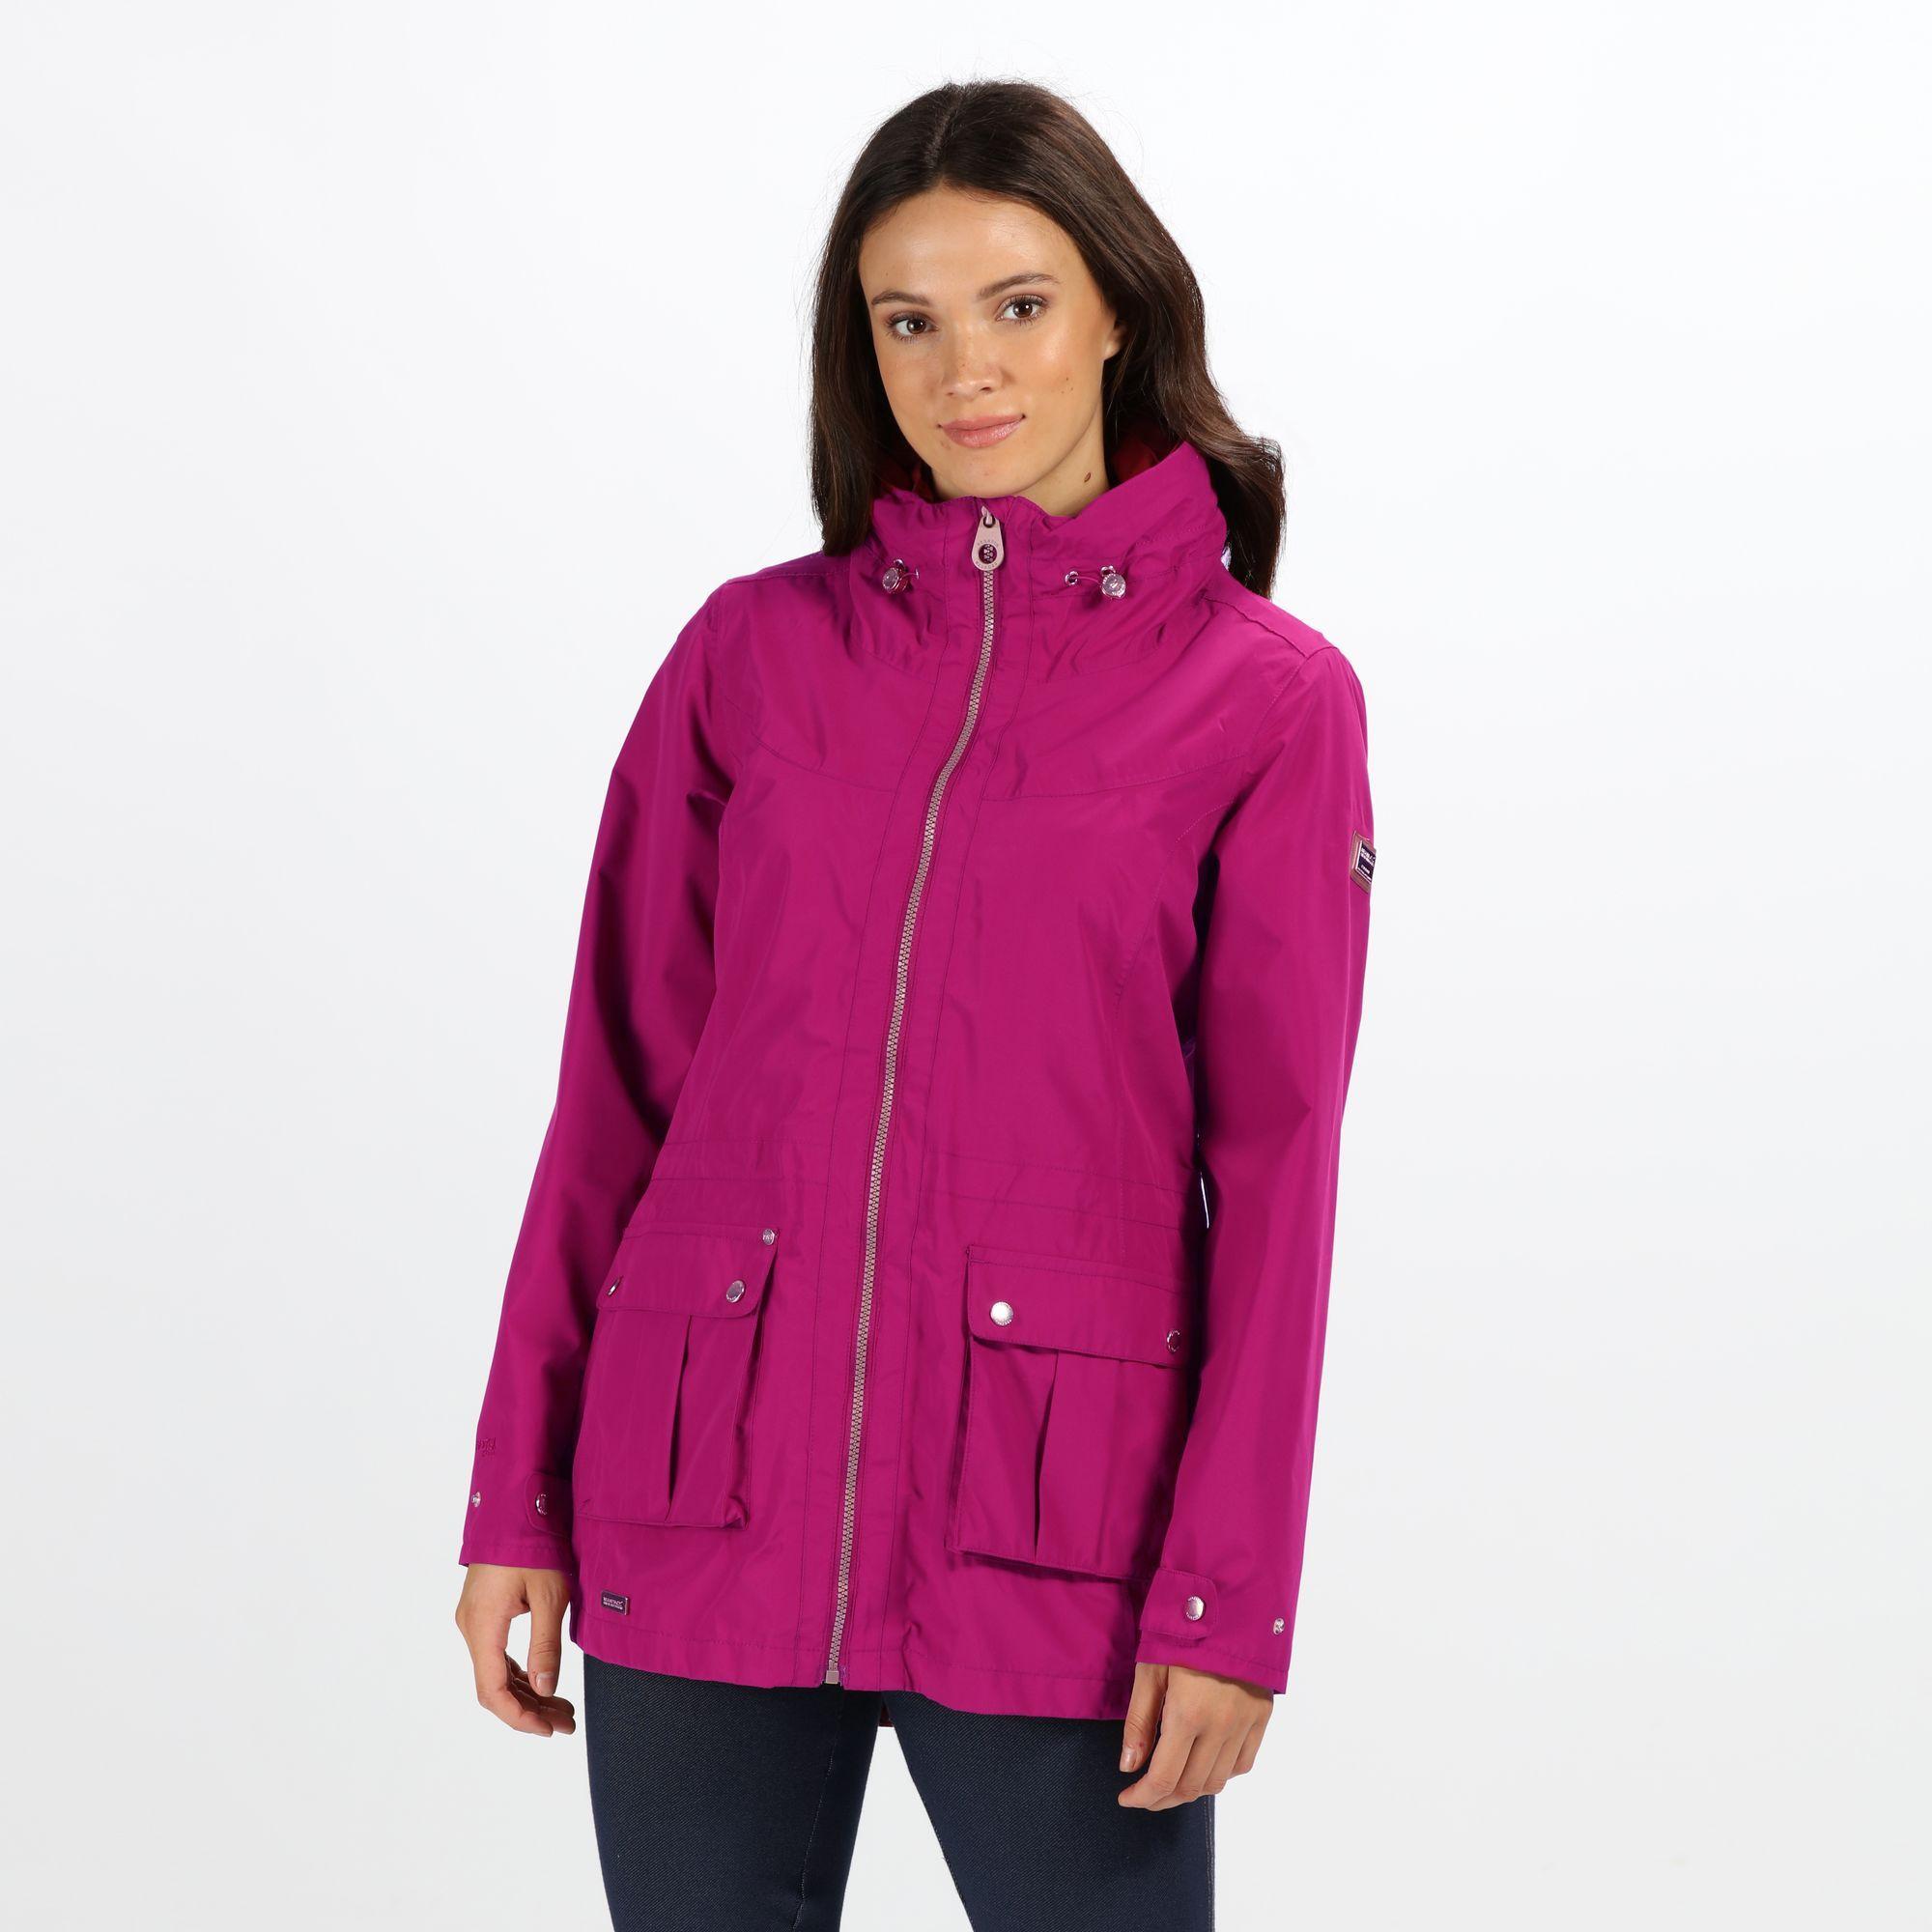 dd7bfa4694 regatta-womens-nakotah-lightweight-waterproof-jacket -with-concealed-hood-beaujolais.jpg